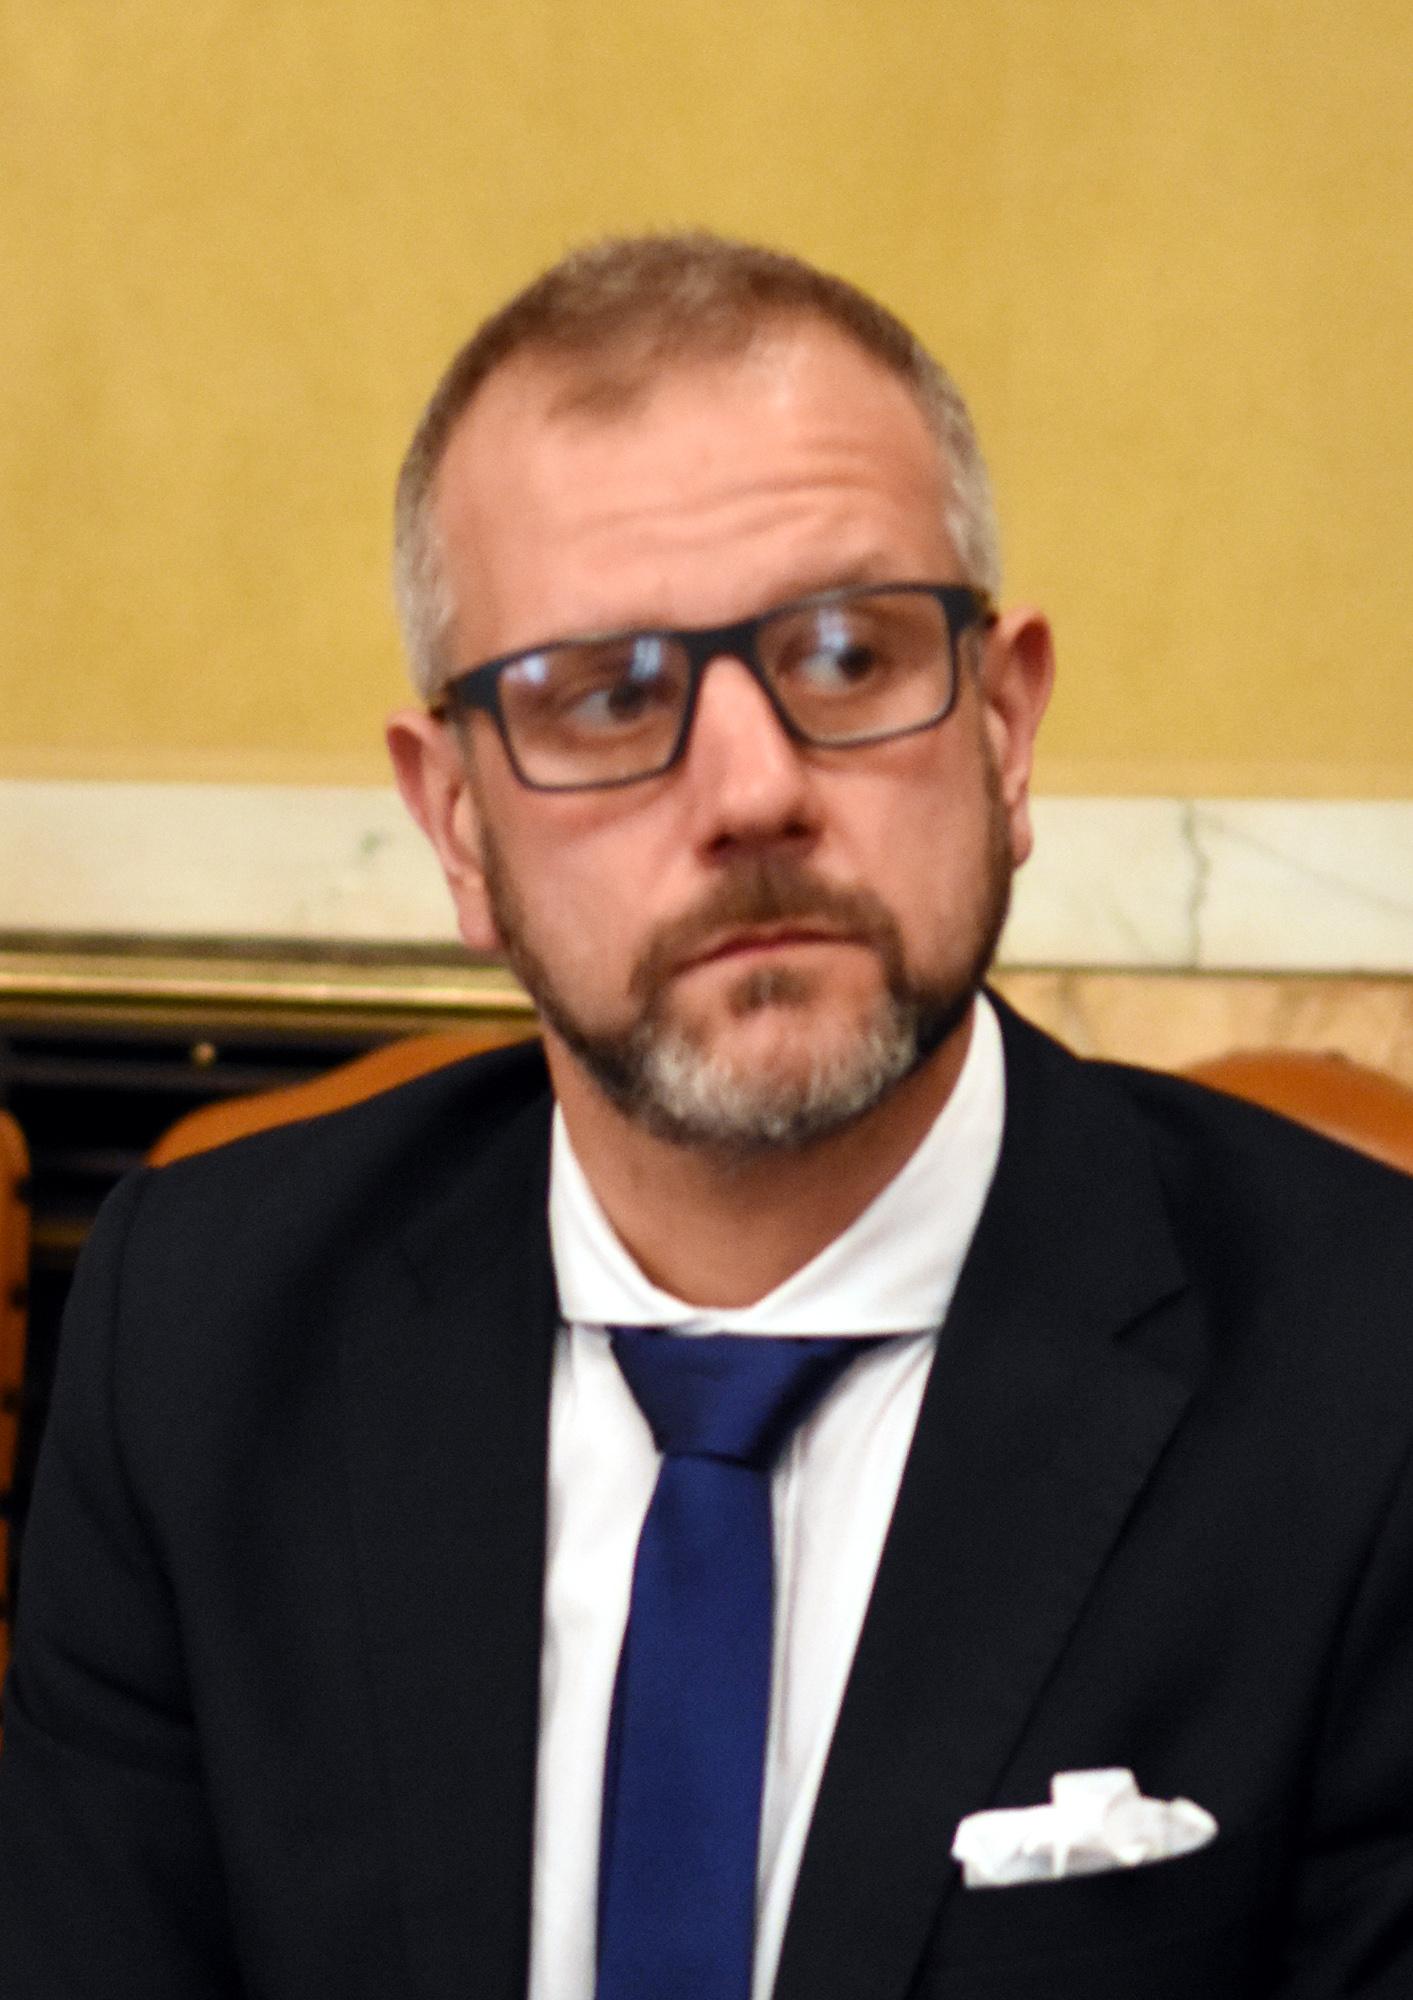 Roberto cella citt metropolitana di genova - Regione liguria certificazioni energetiche ...